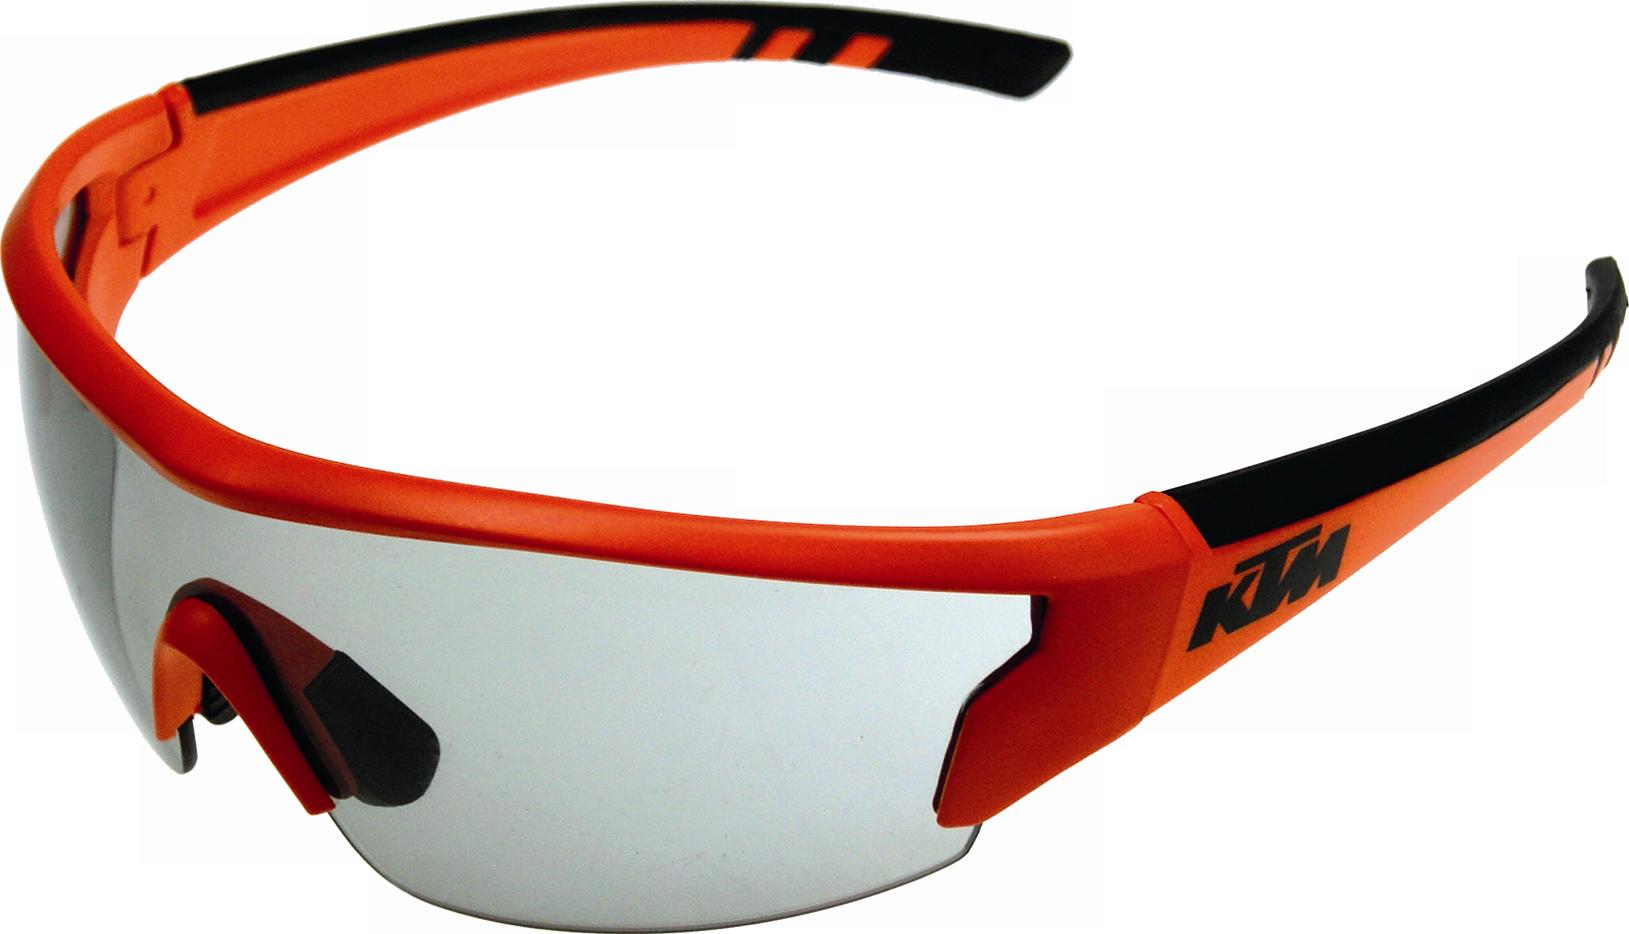 KTM brýle Factory Team